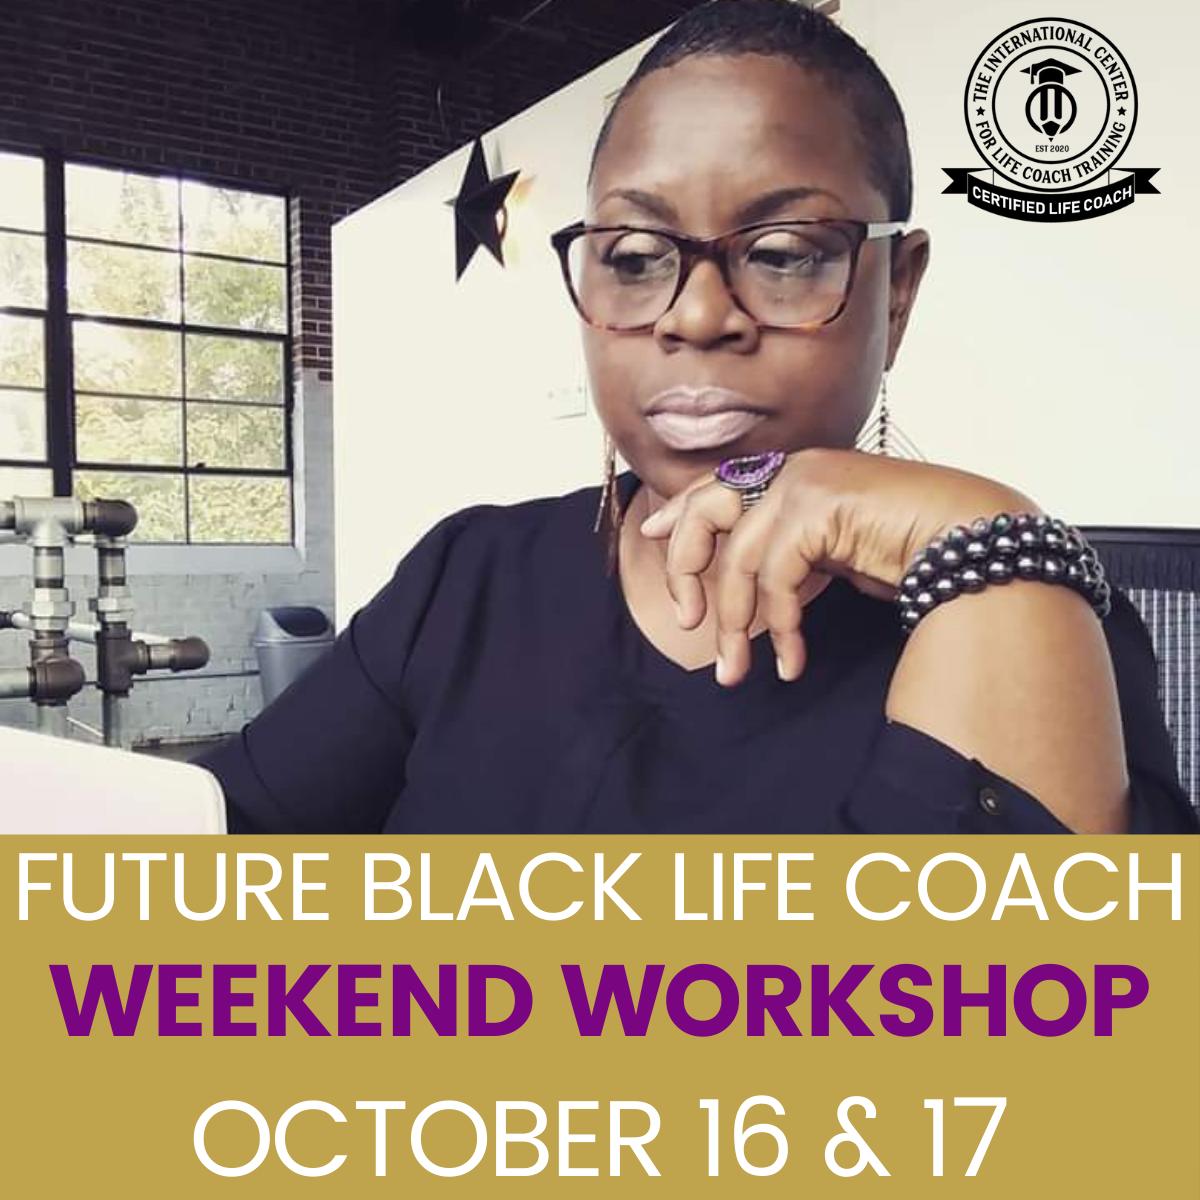 Future Black Life Coach Weekend Workshop